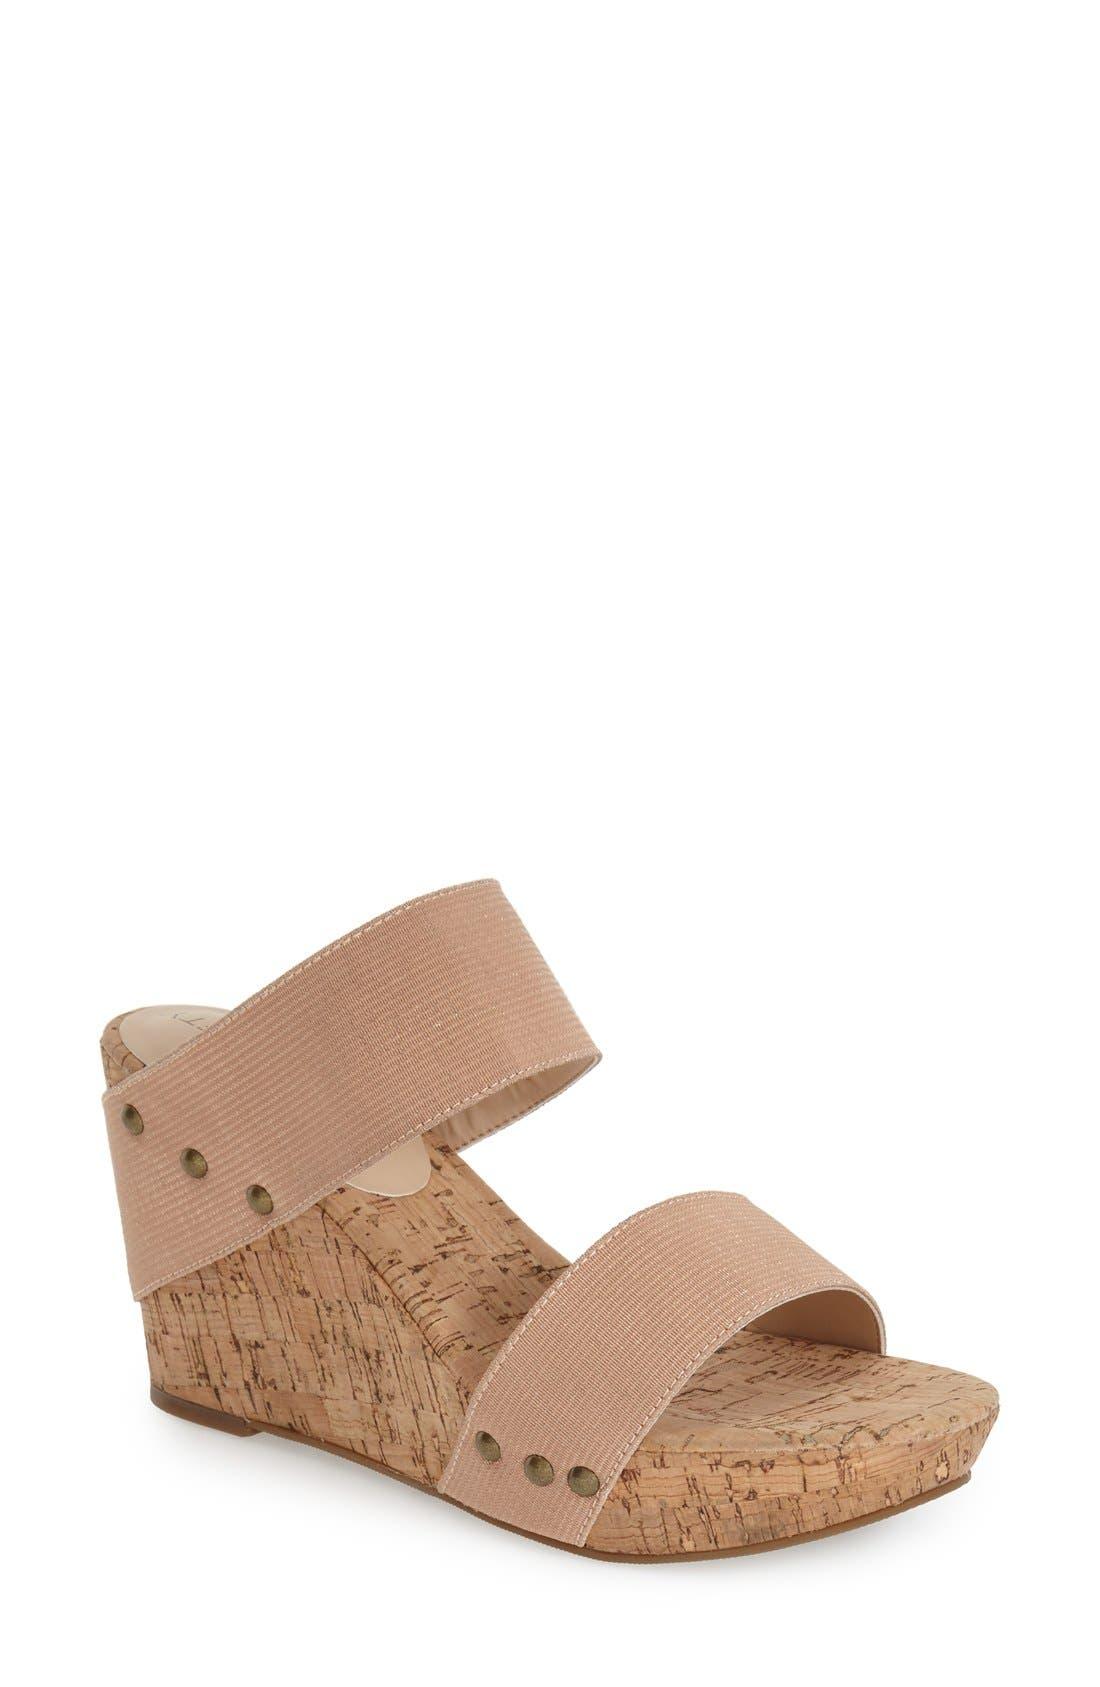 'Emilia 2' Wedge Sandal,                         Main,                         color, Blush Champagne